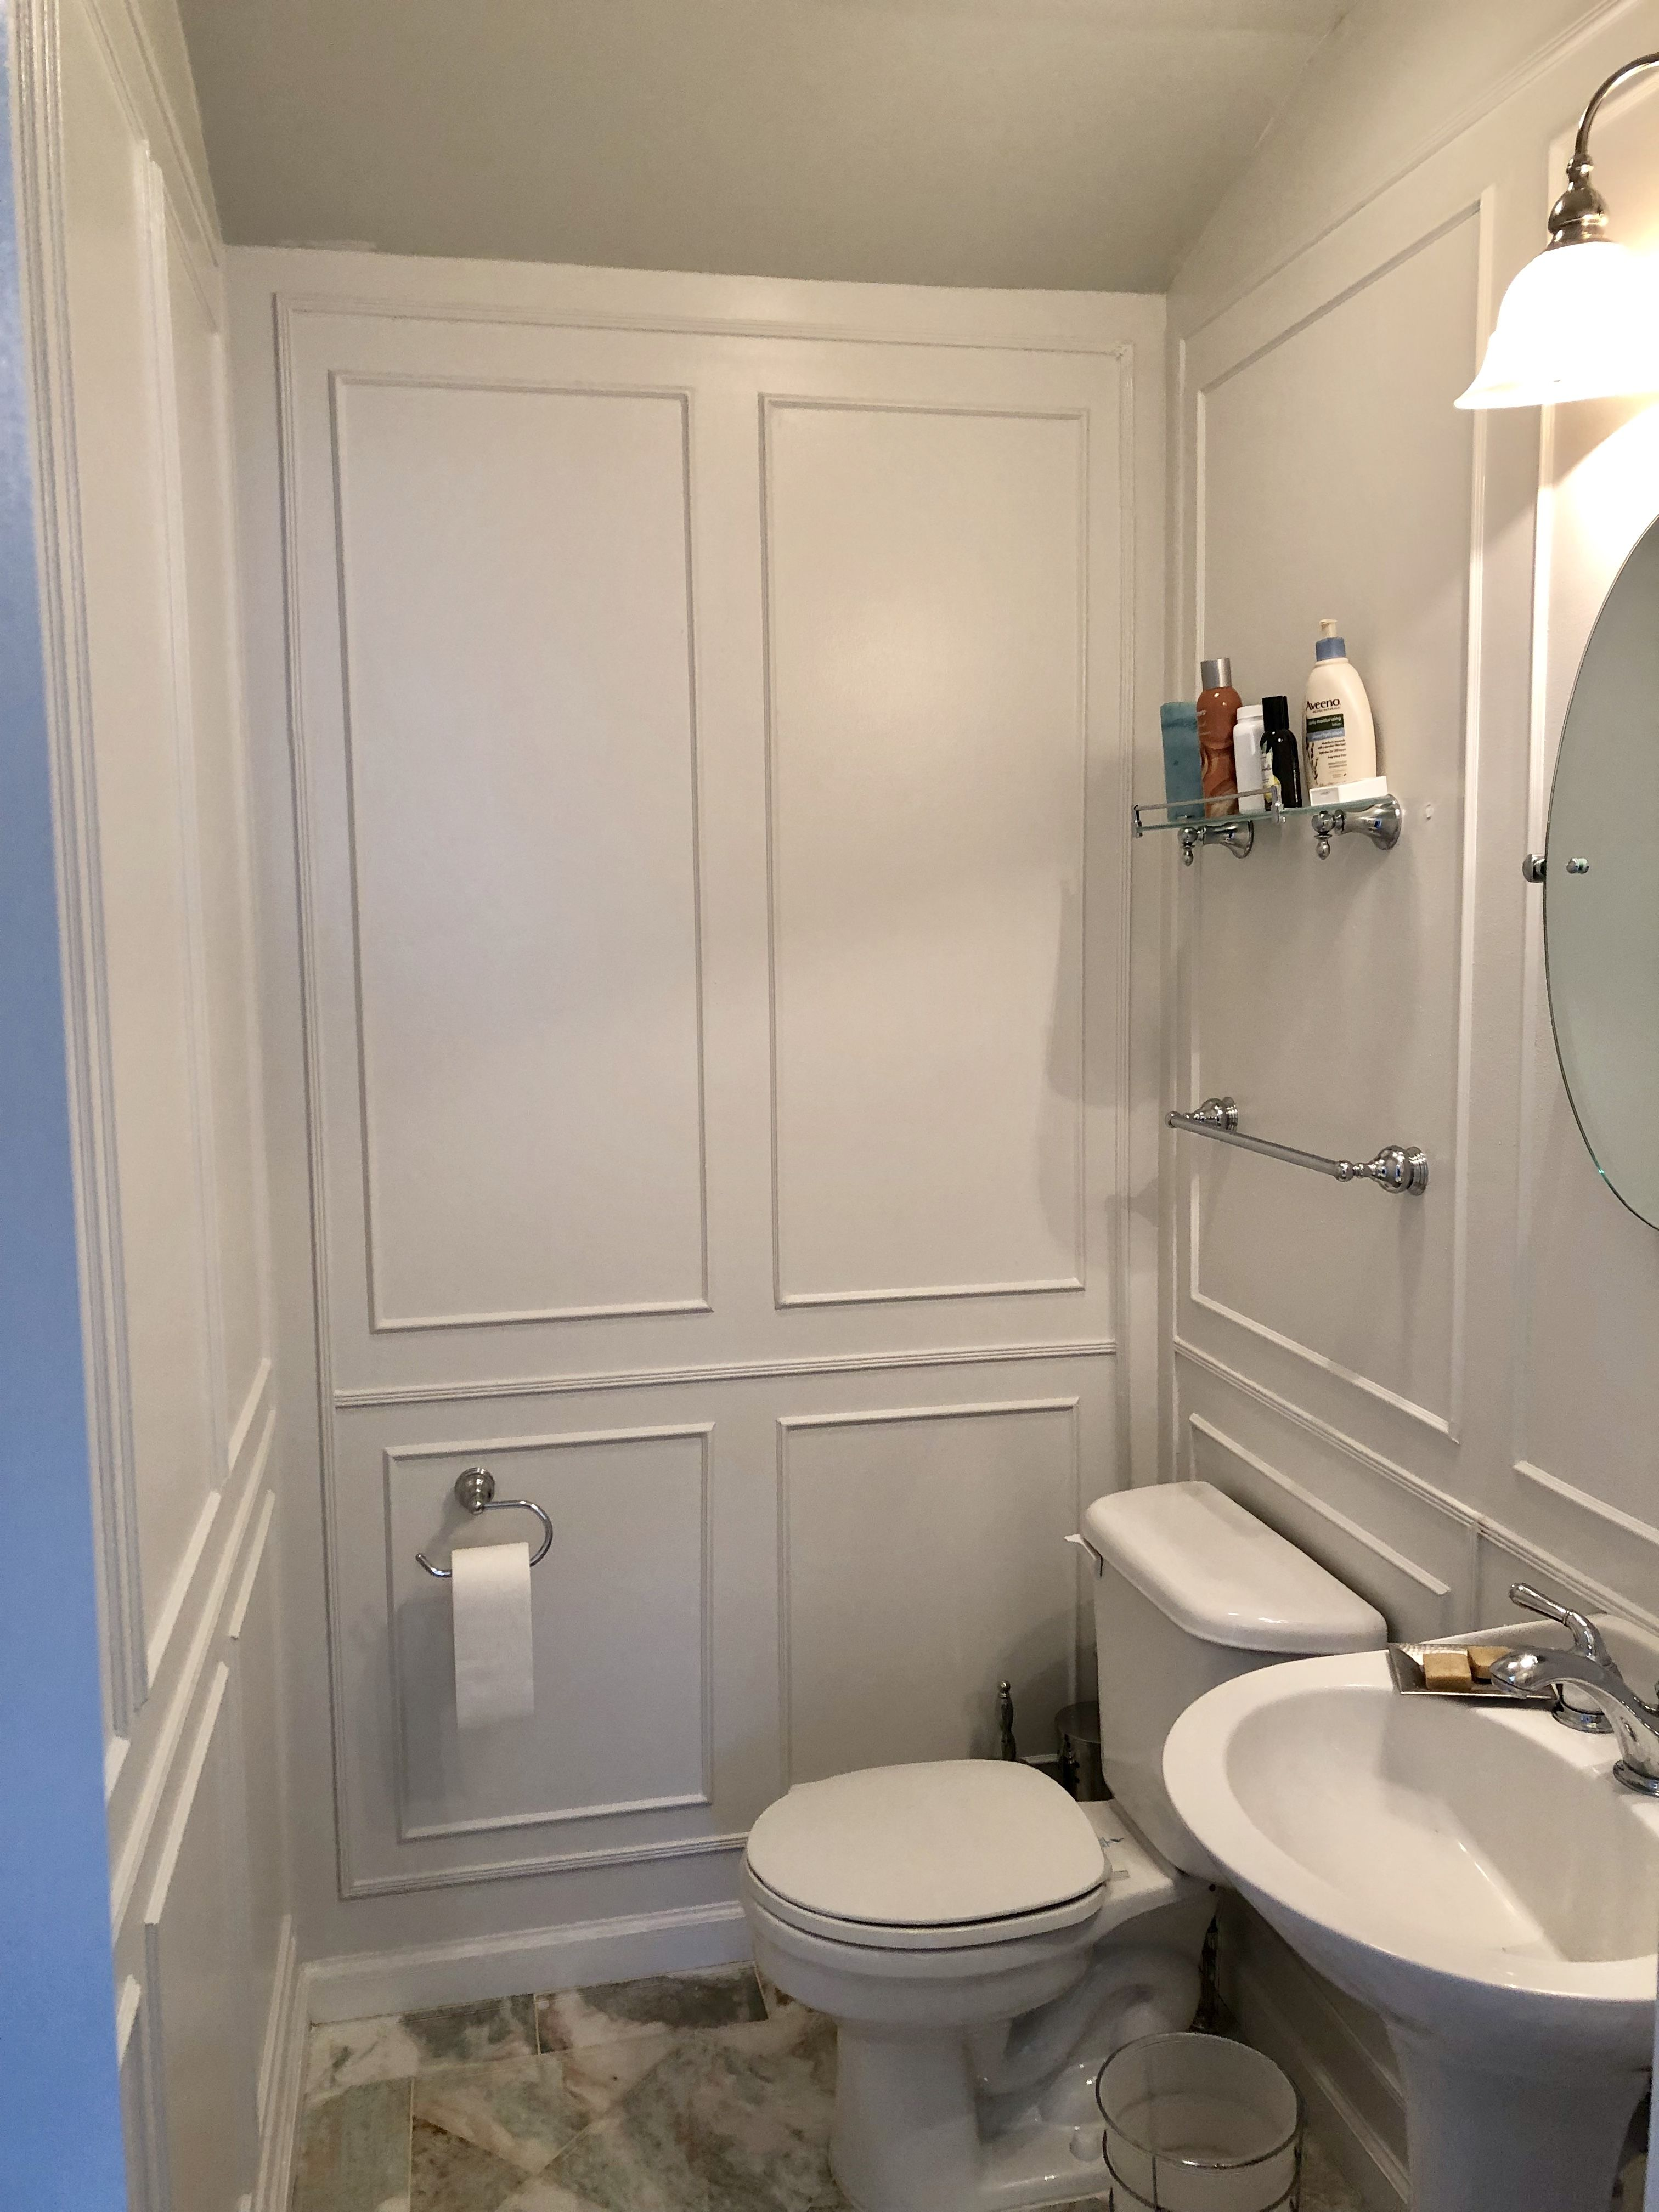 Smallbathroom Walltrim Small Bathroom Makeover Mold In Bathroom Small Bathroom Remodel